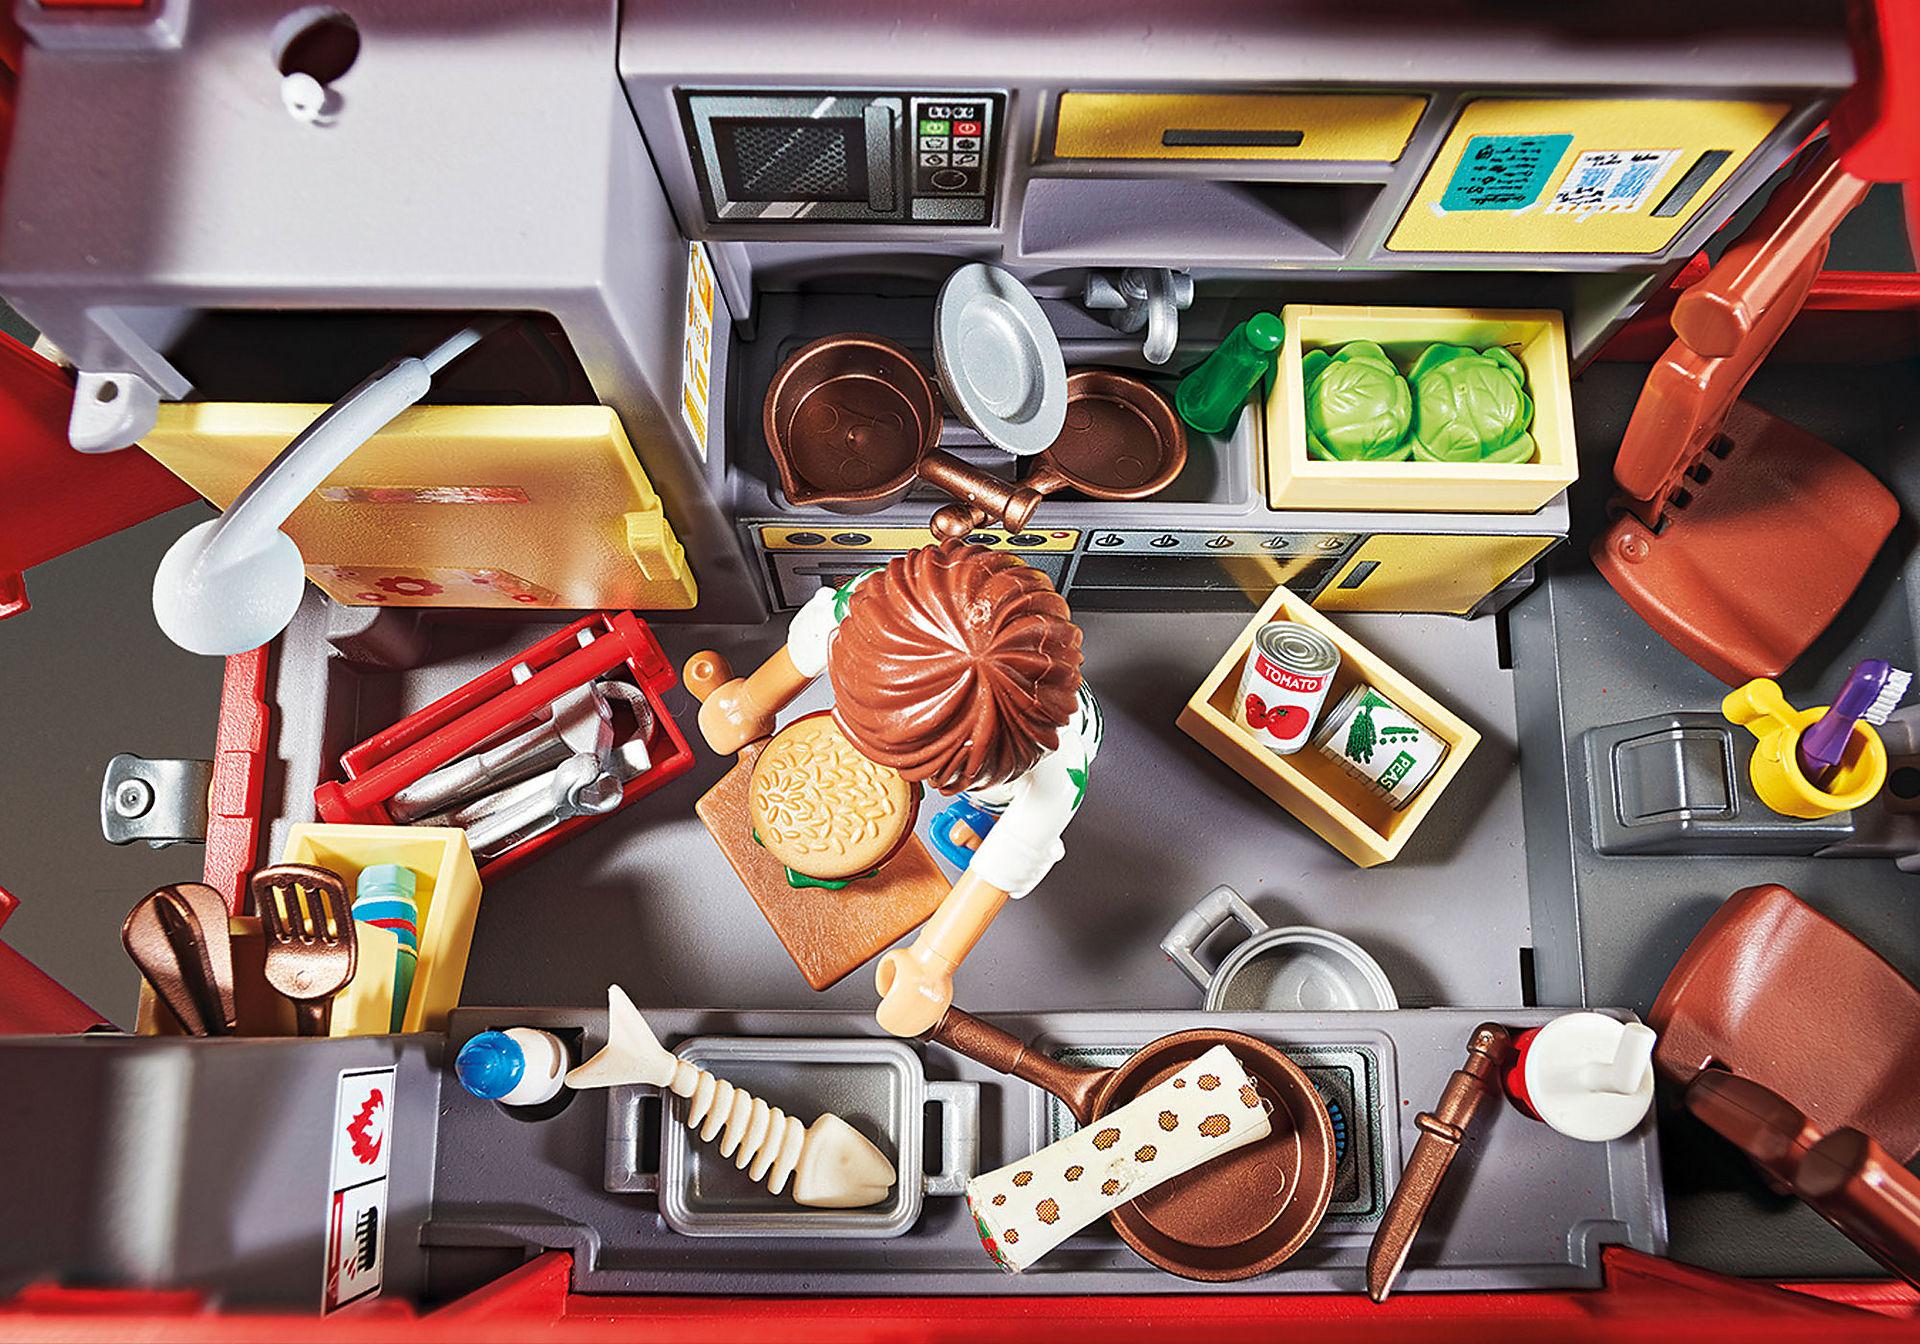 http://media.playmobil.com/i/playmobil/70075_product_extra1/PLAYMOBIL: THE MOVIE Food Truck de Del